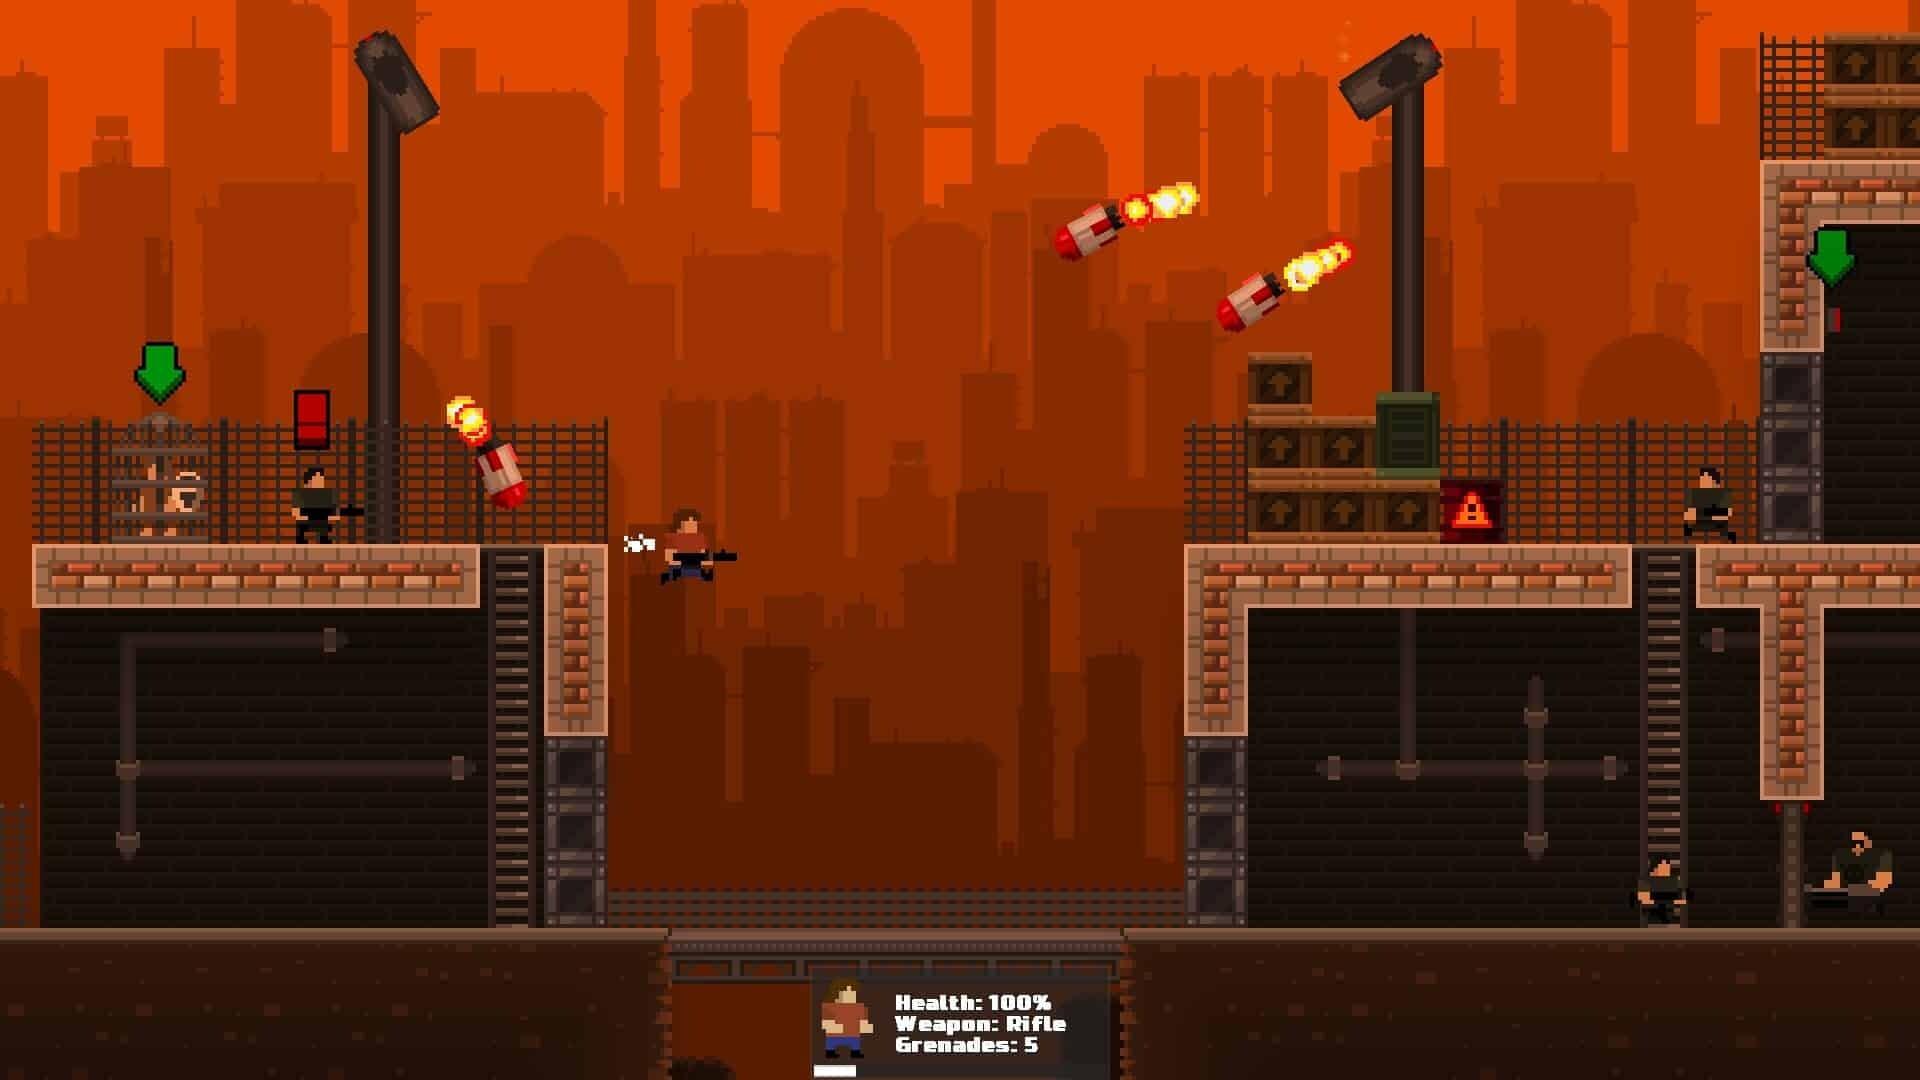 GunHero game screenshot, missiles